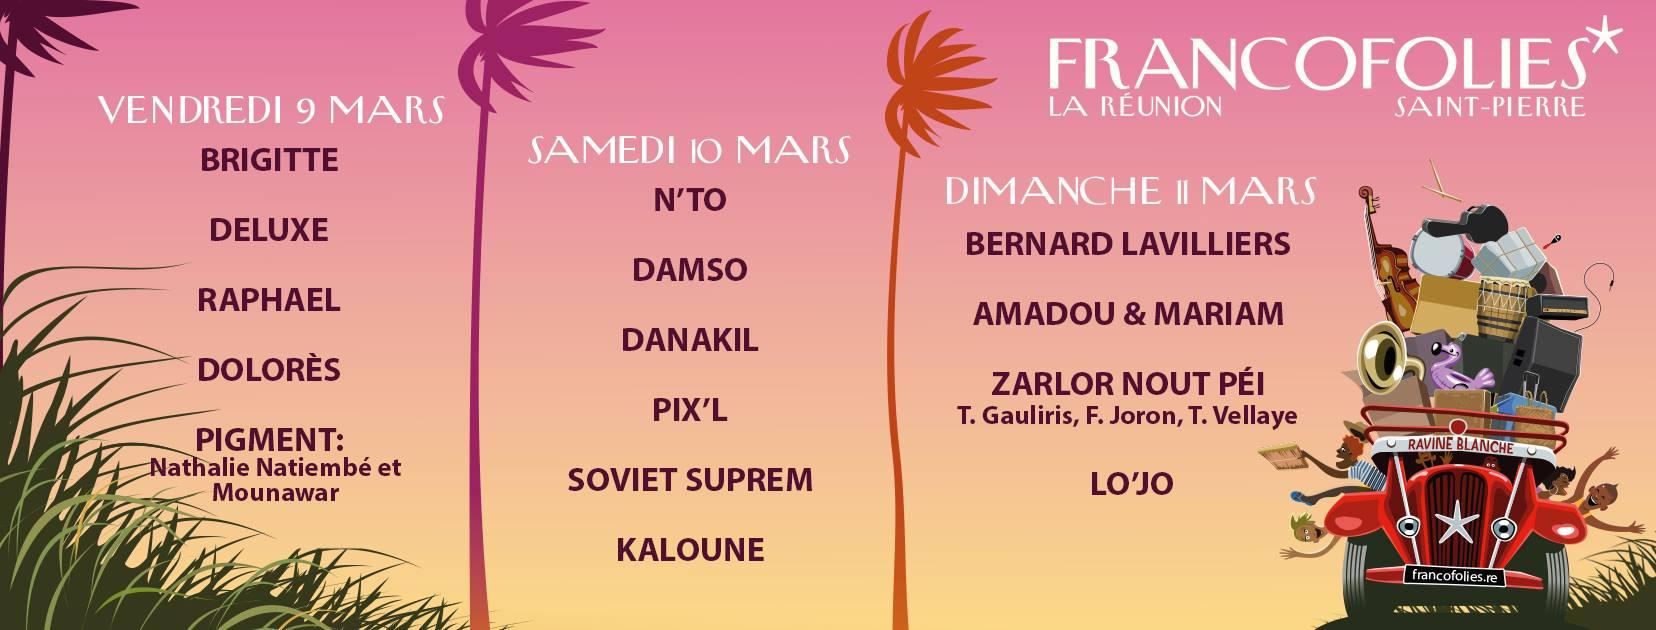 Programmation-Francofolies-Réunion-2018